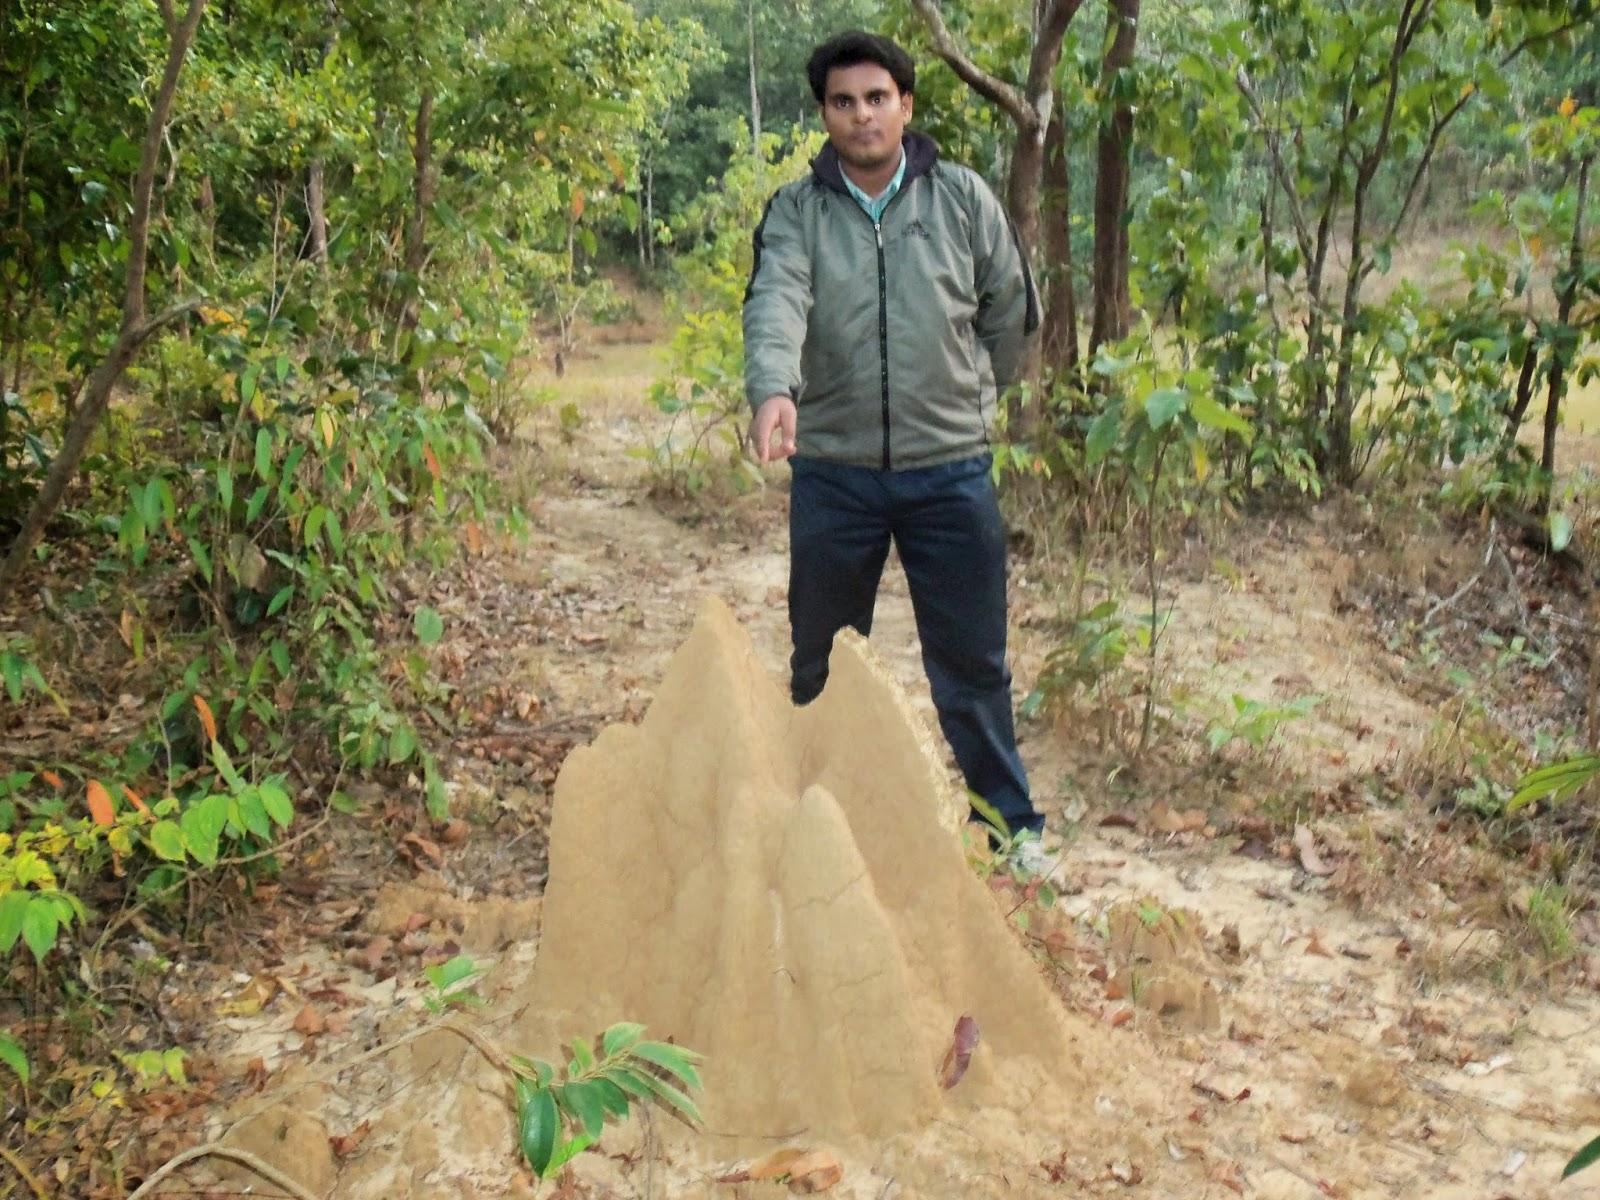 A termite's mound in the jungle